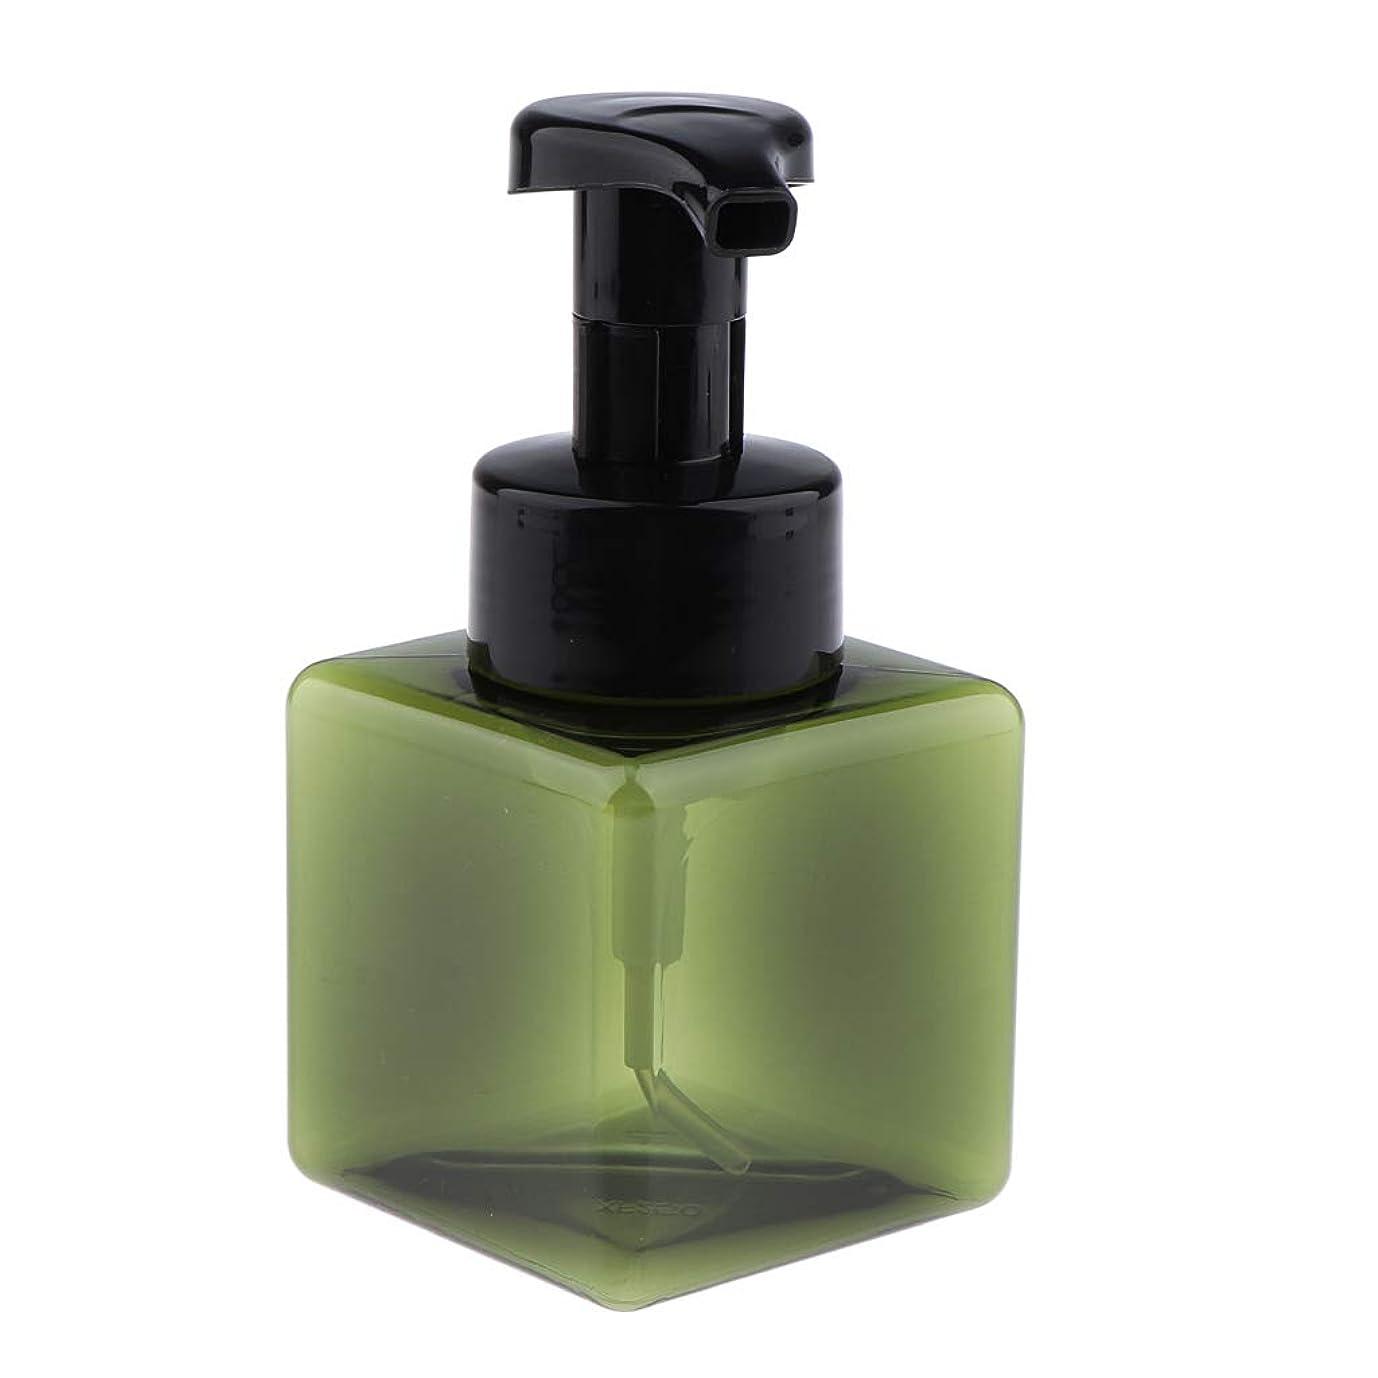 CUTICATE 浴室の台所ホテル用 詰め替え式 泡立つ石鹸ディスペンサーポンプびん 正方形 250ml - 濃い緑色